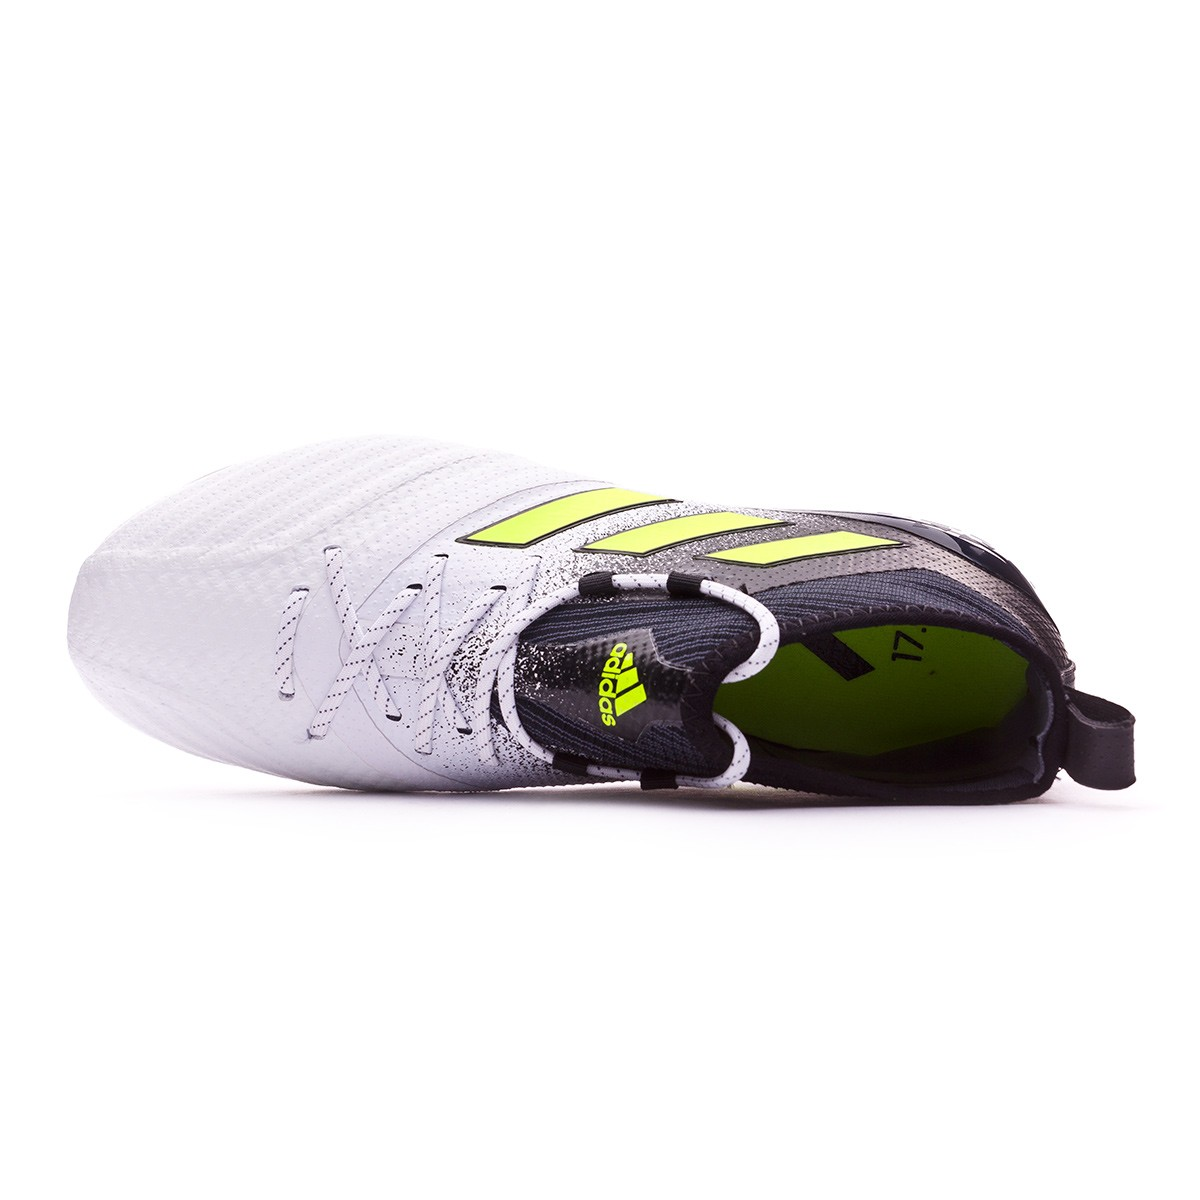 a9e7d0540 Football Boots adidas Ace 17.1 Primeknit SG White-Solar yellow-Core black -  Tienda de fútbol Fútbol Emotion